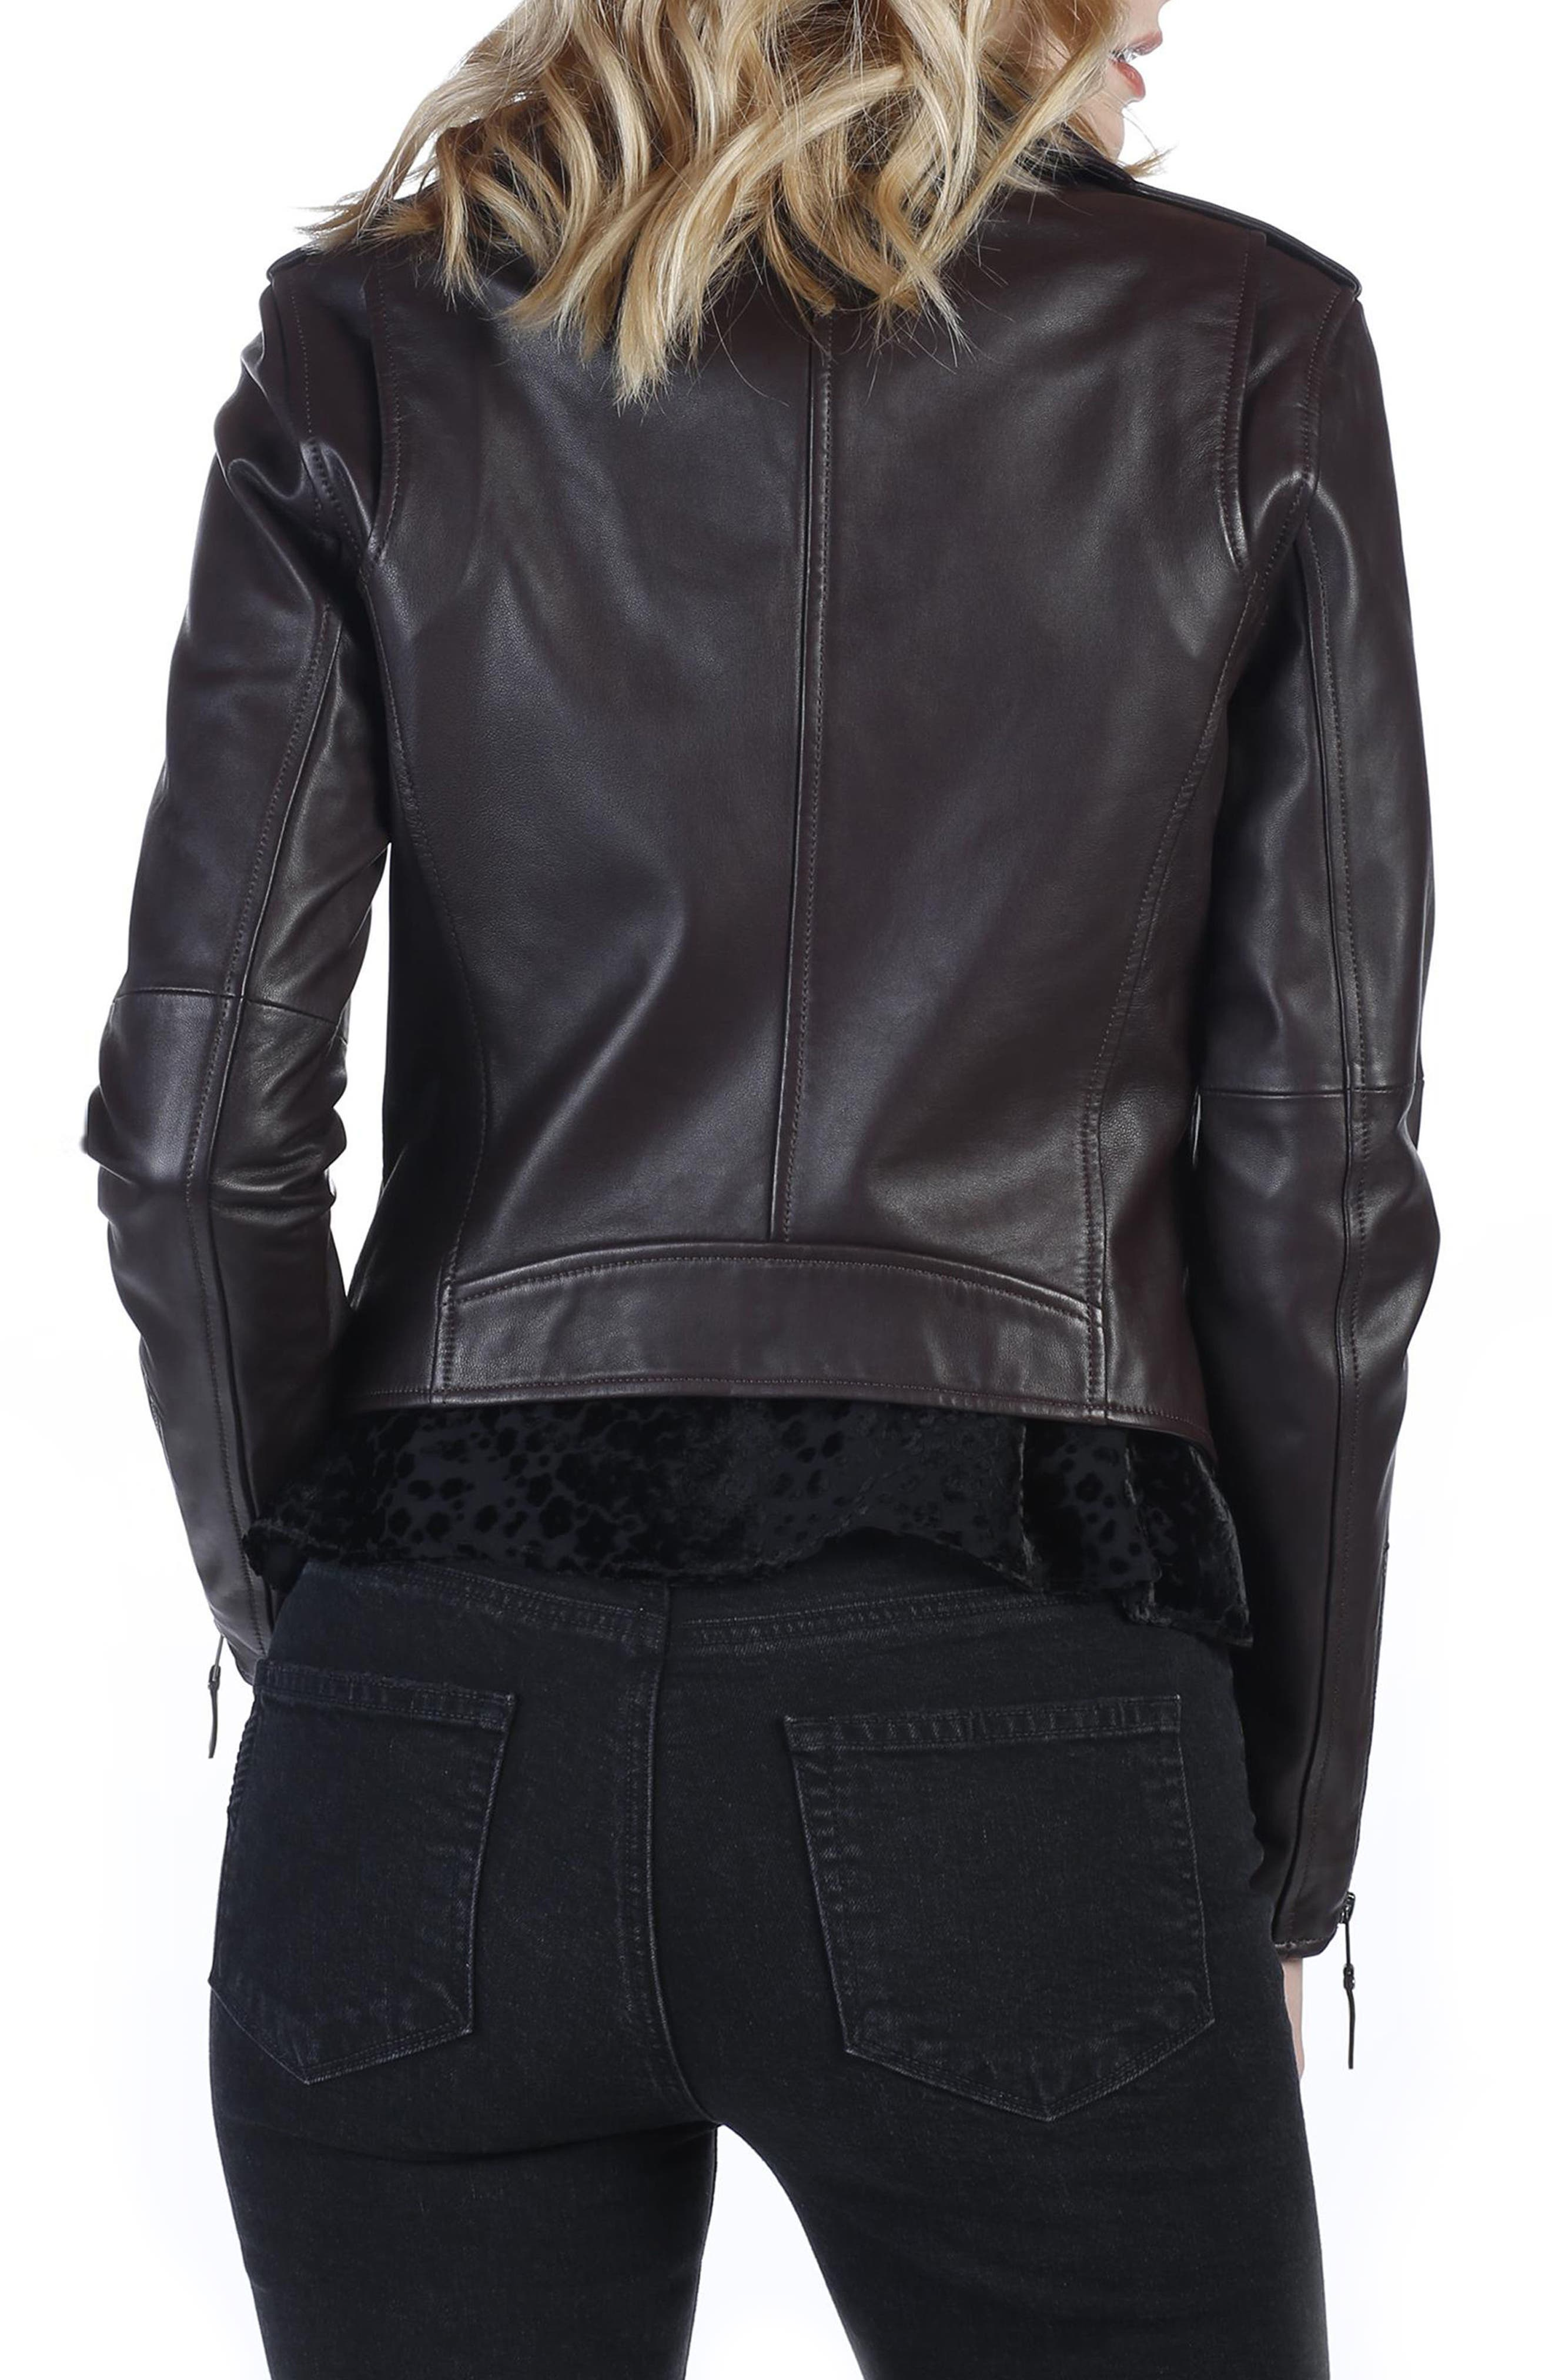 Danette Leather Moto Jacket,                             Alternate thumbnail 3, color,                             Black Cherry